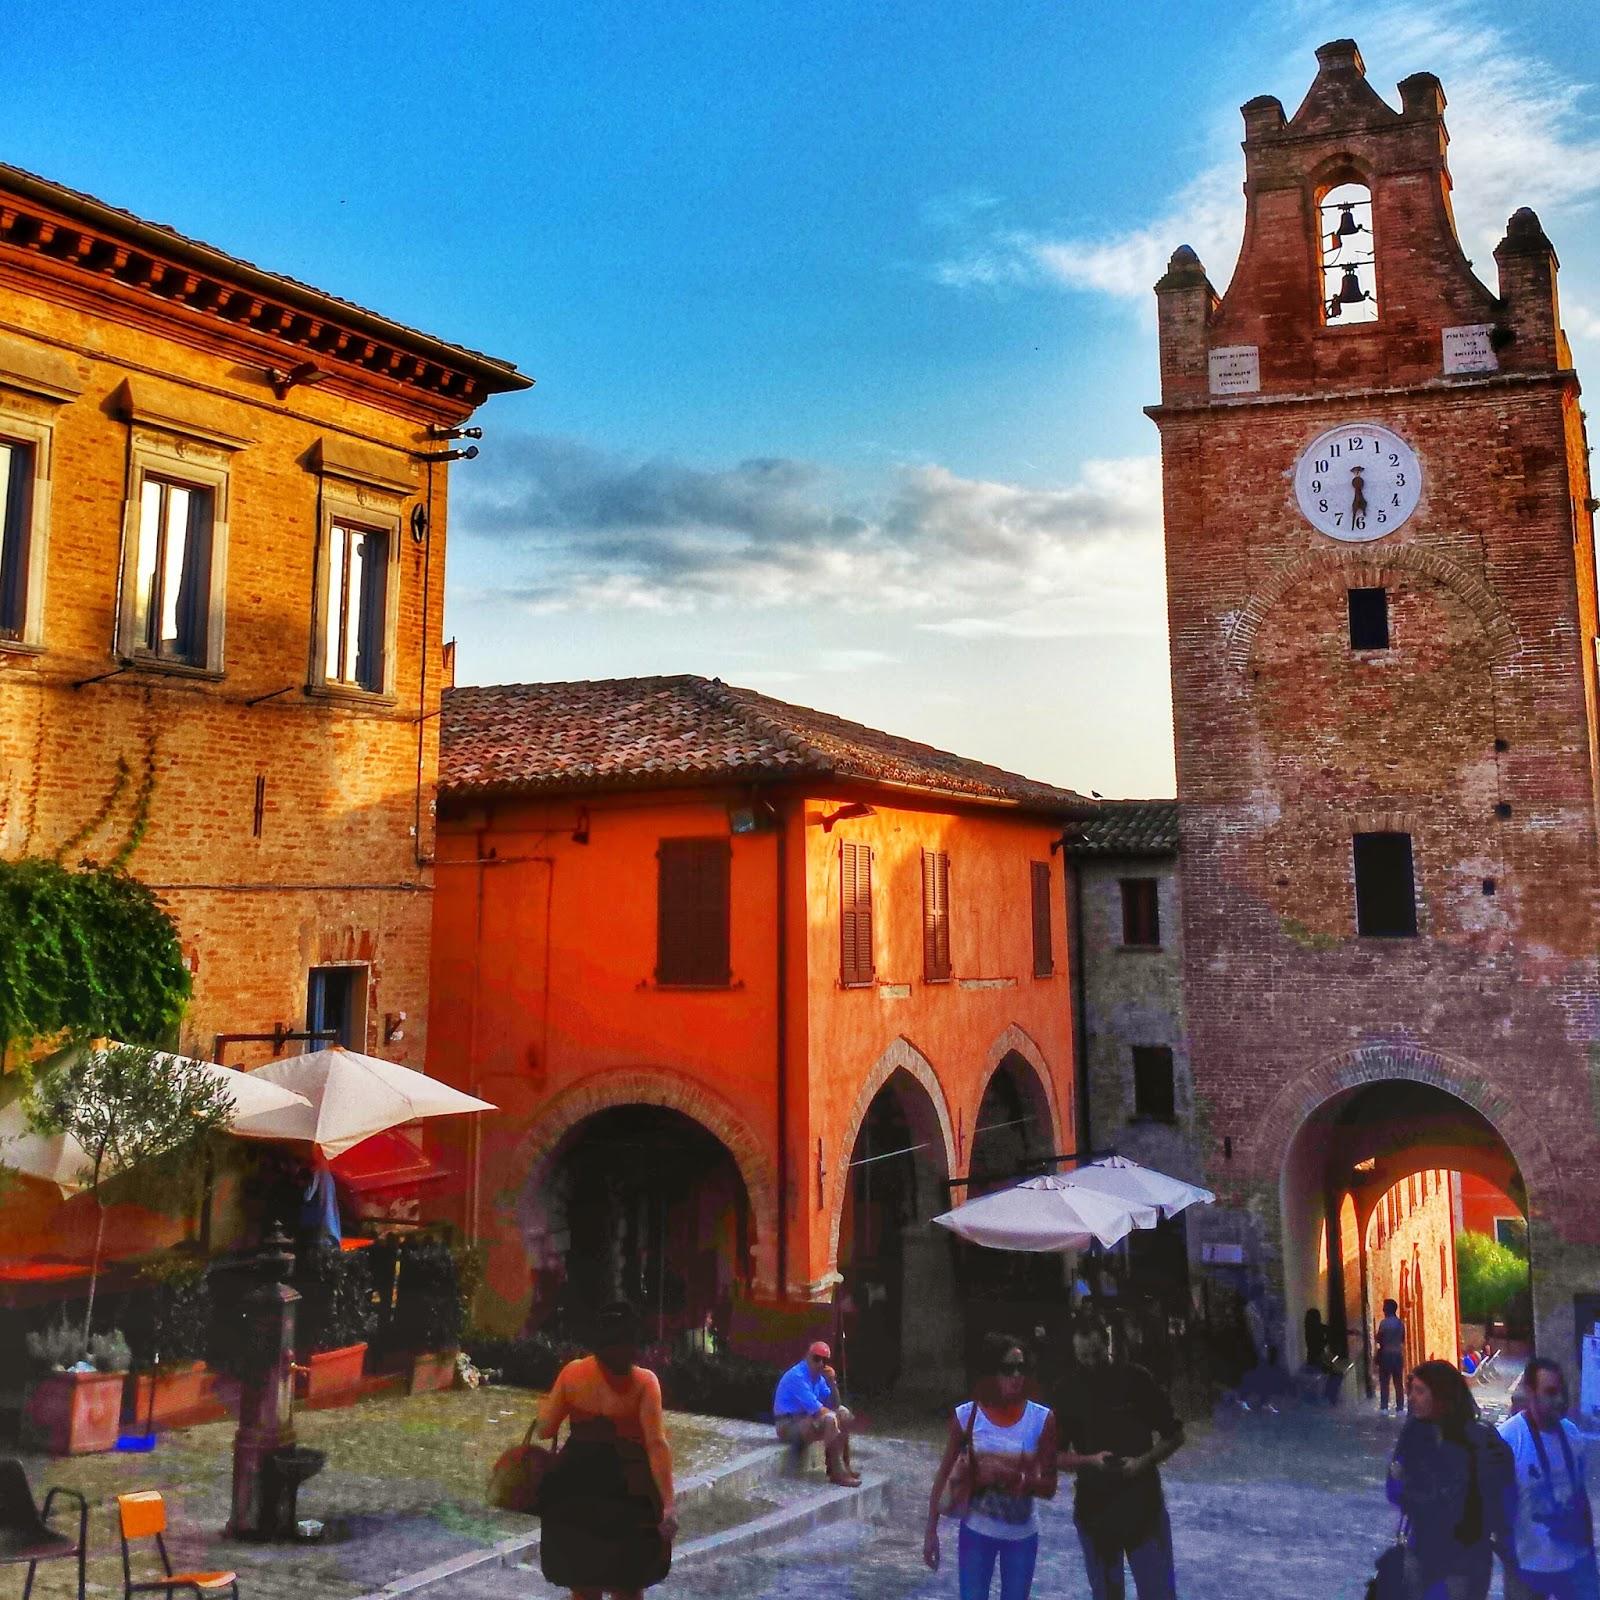 Gradara, Italy: 10 Destination Photos on Instagram that Make You Want to Travel